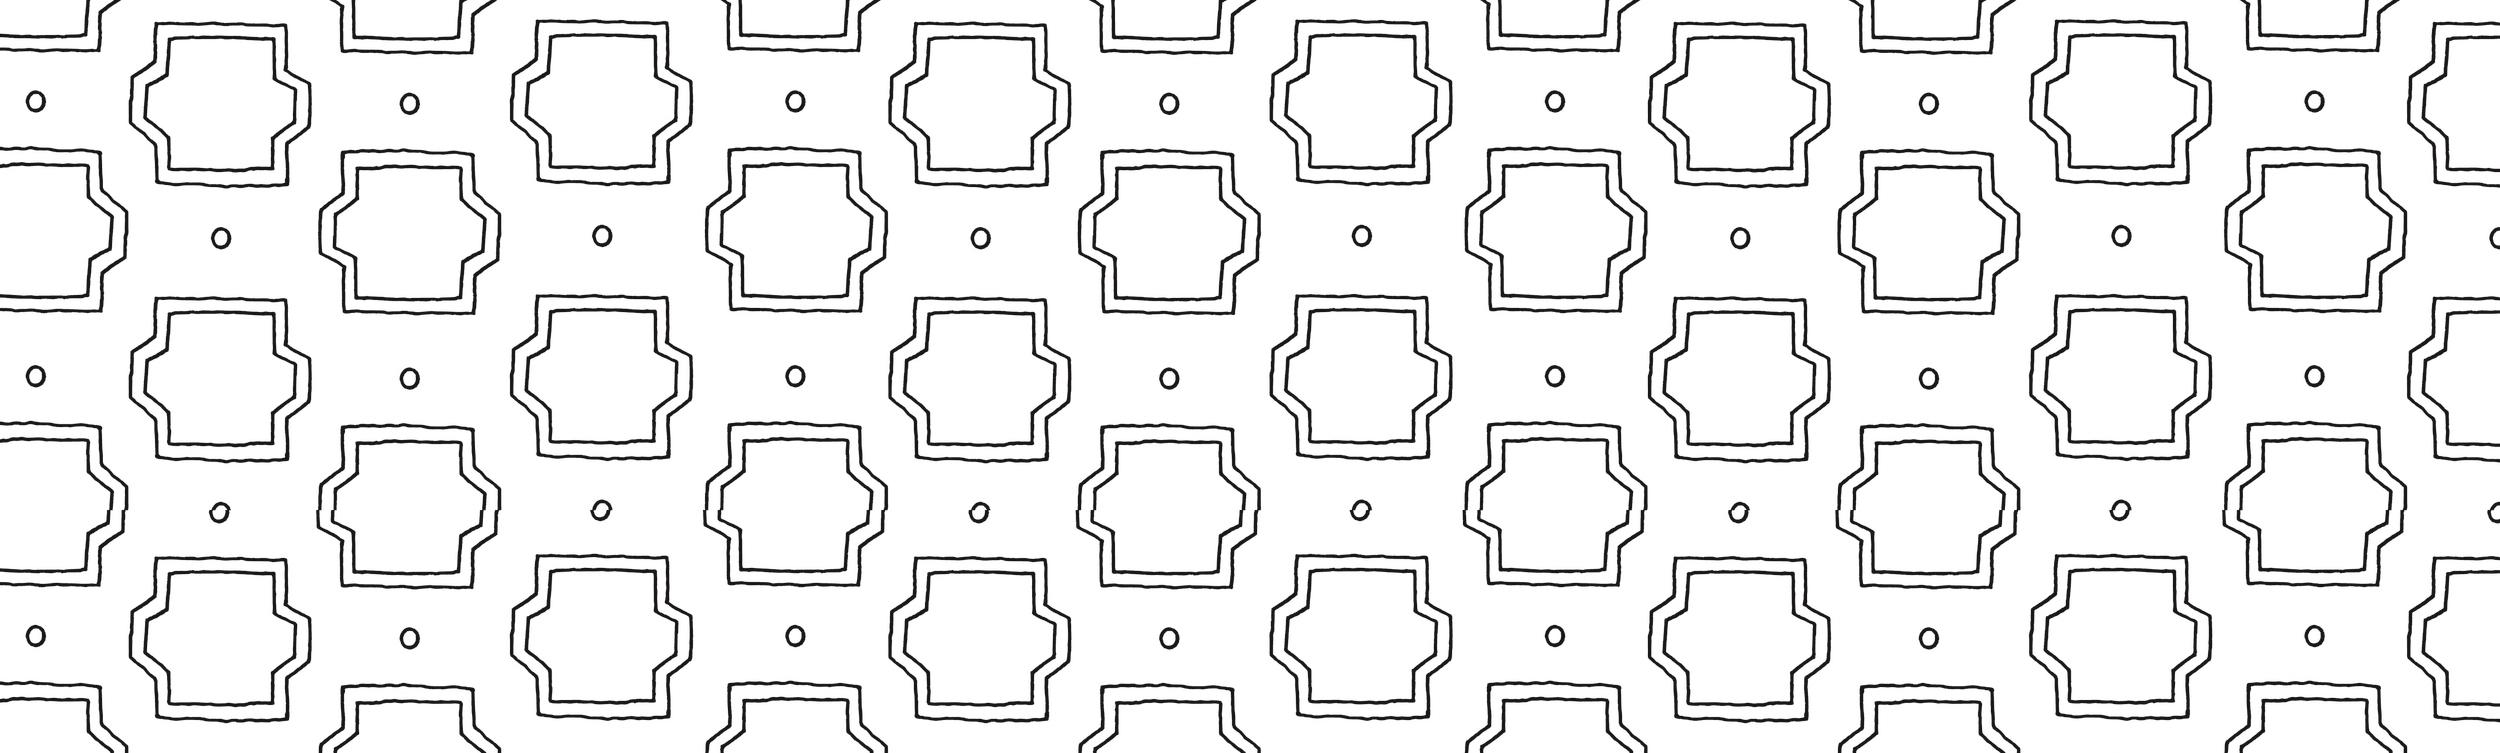 HTEP_Patterns_Brand-01.jpg